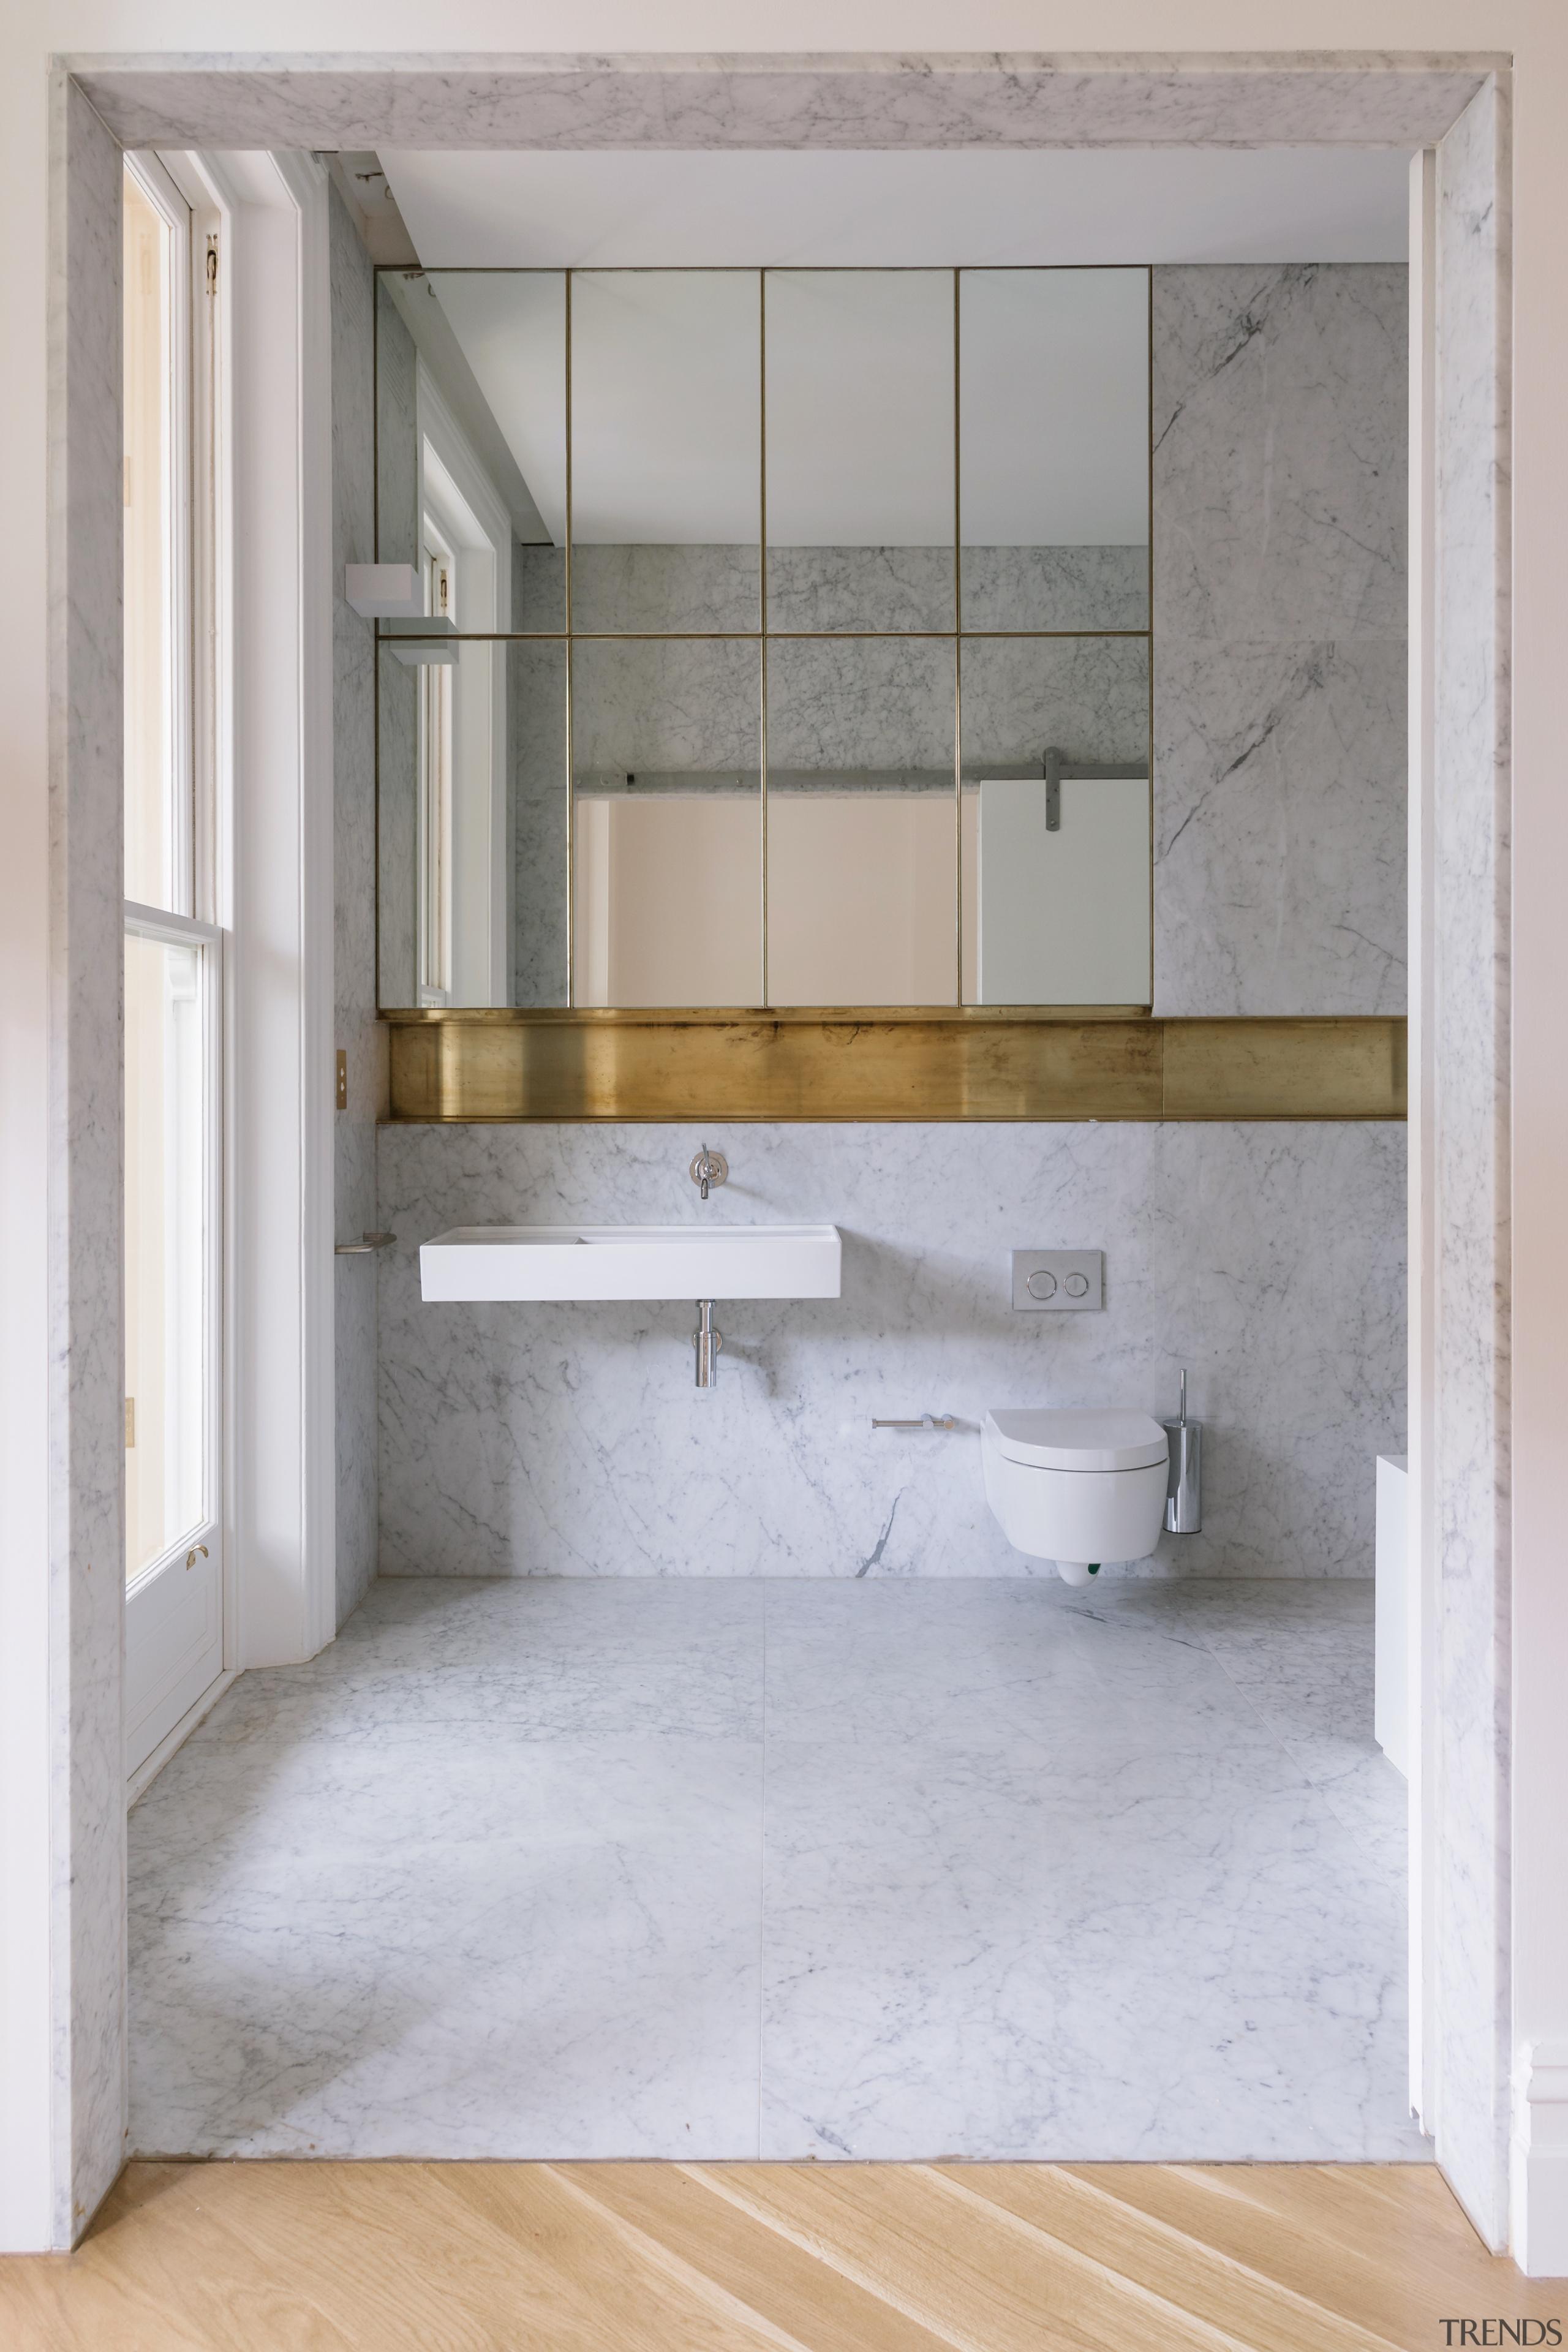 In this bathroom, a classic room-high sash window architecture, bathroom, bathroom accessory, bathroom cabinet, floor, interior design, sink, gray